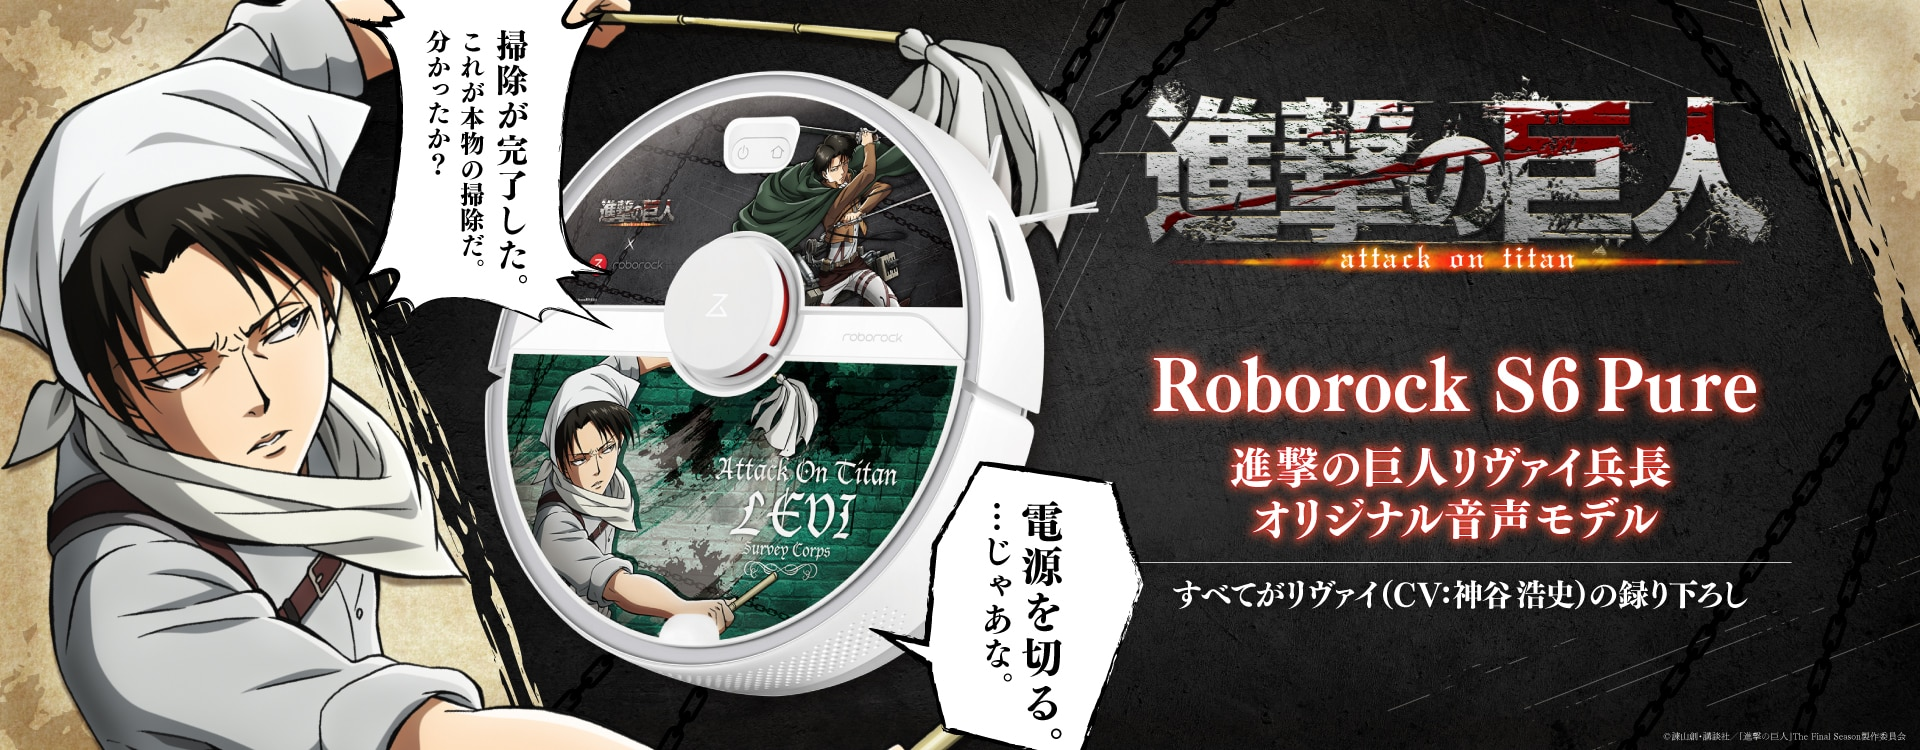 Roborock S6 Pure 進撃の巨人リヴァイ兵長オリジナル音声モデル